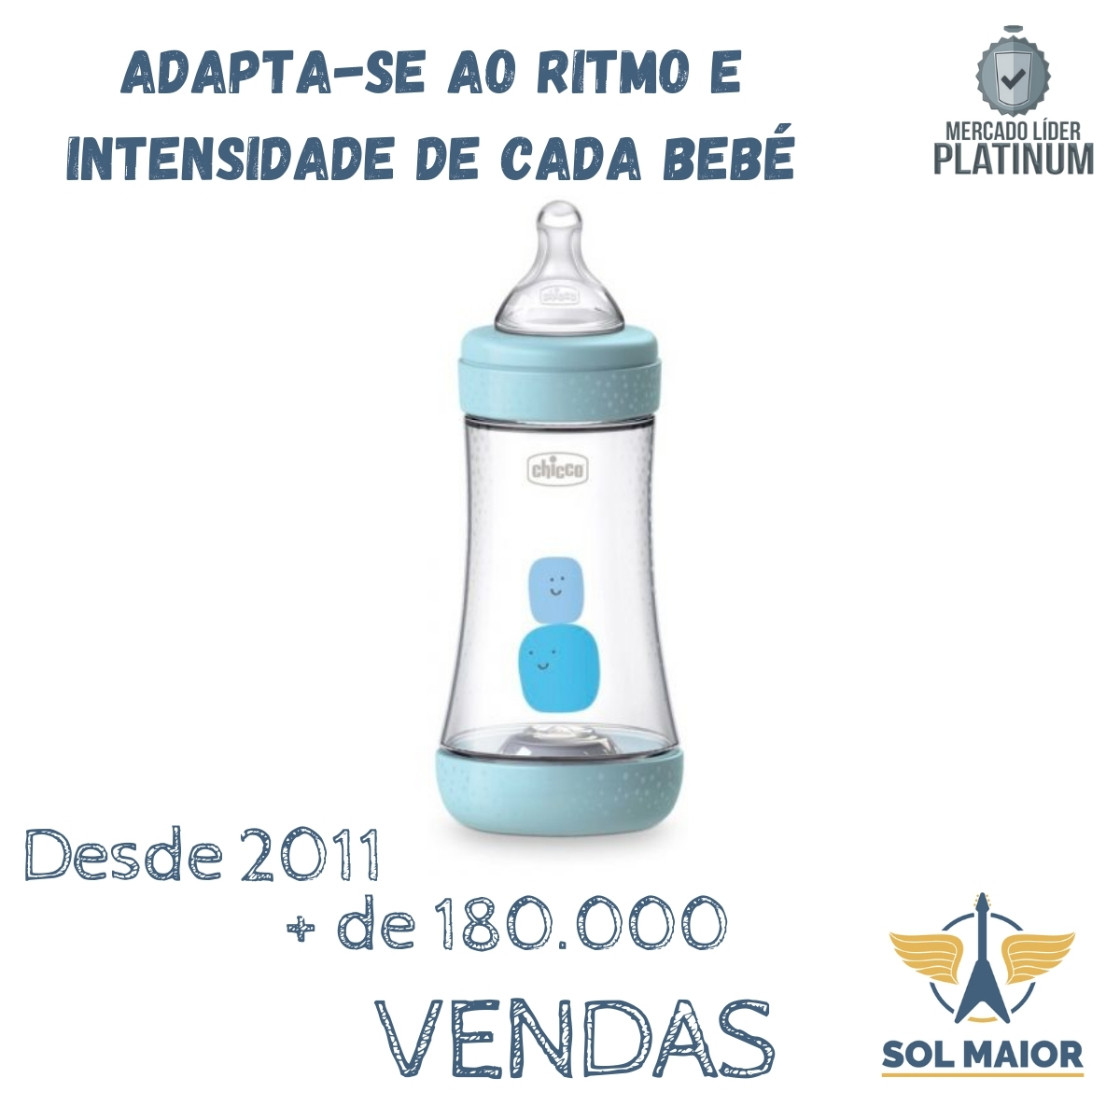 Mamadeira Chicco Perfect5 240ml (Fluxo Medio) - Azul